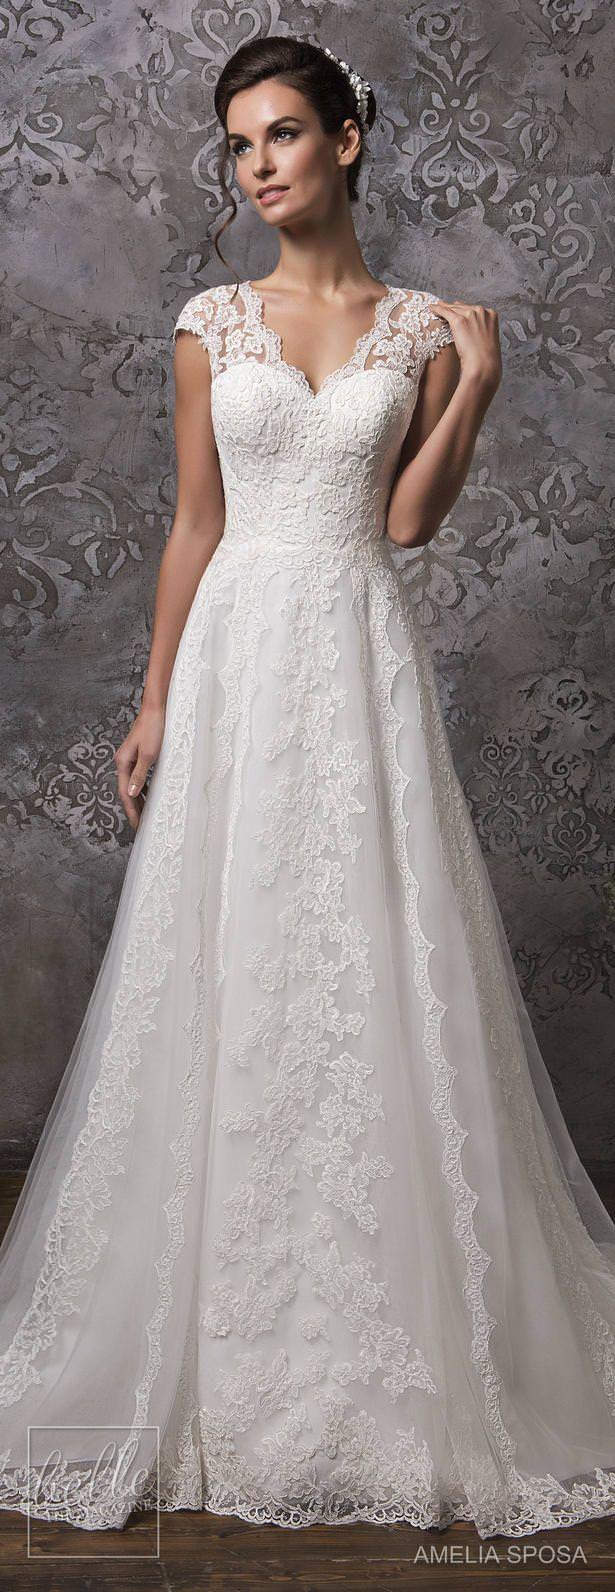 Amelia Sposa Wedding Dress Collection Fall 2018 Amelia Sposa Wedding Dress Pretty Wedding Dresses Beautiful Wedding Dresses